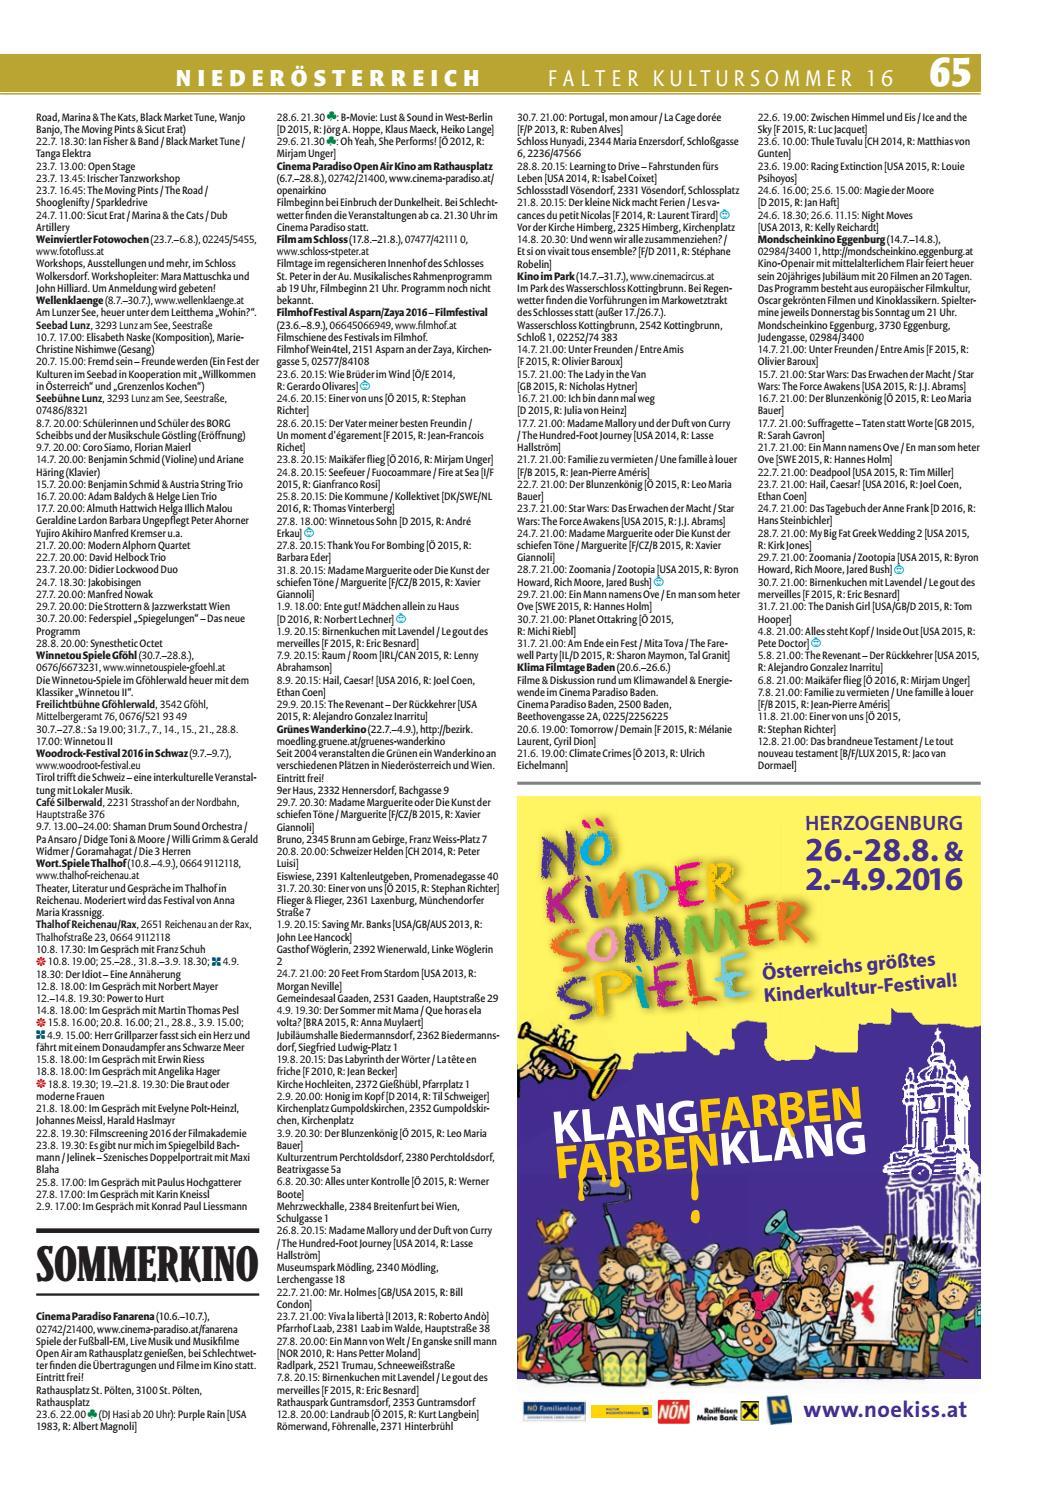 19+ FALTER Kultursommer 8 by Falter Verlagsgesellschaft m.b.H.   issuu Kollektion